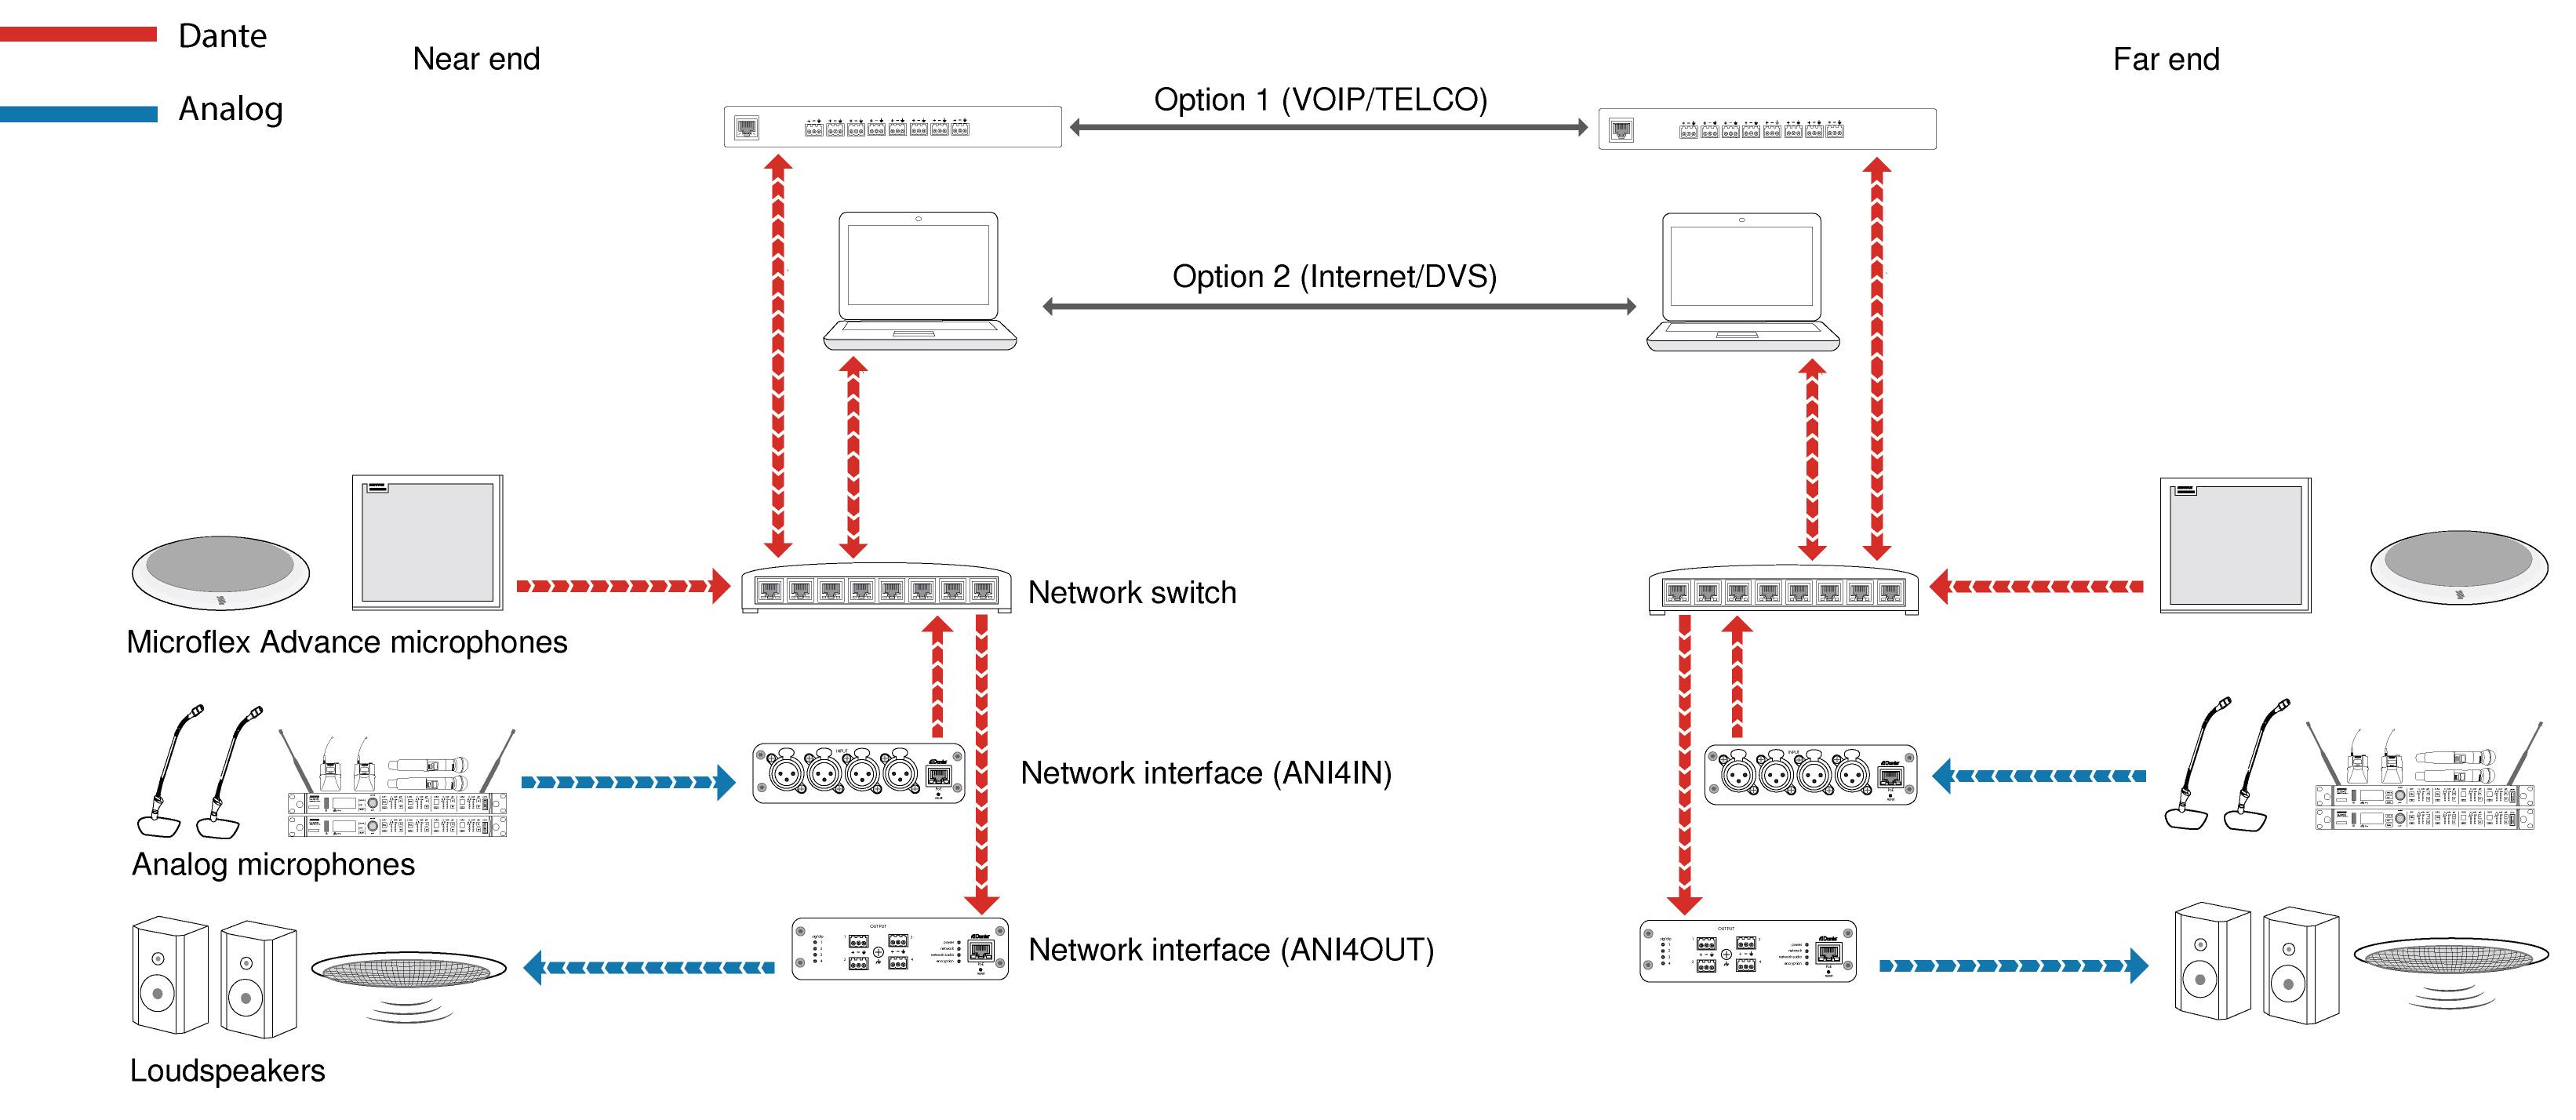 epson artisan 800 network installation guide